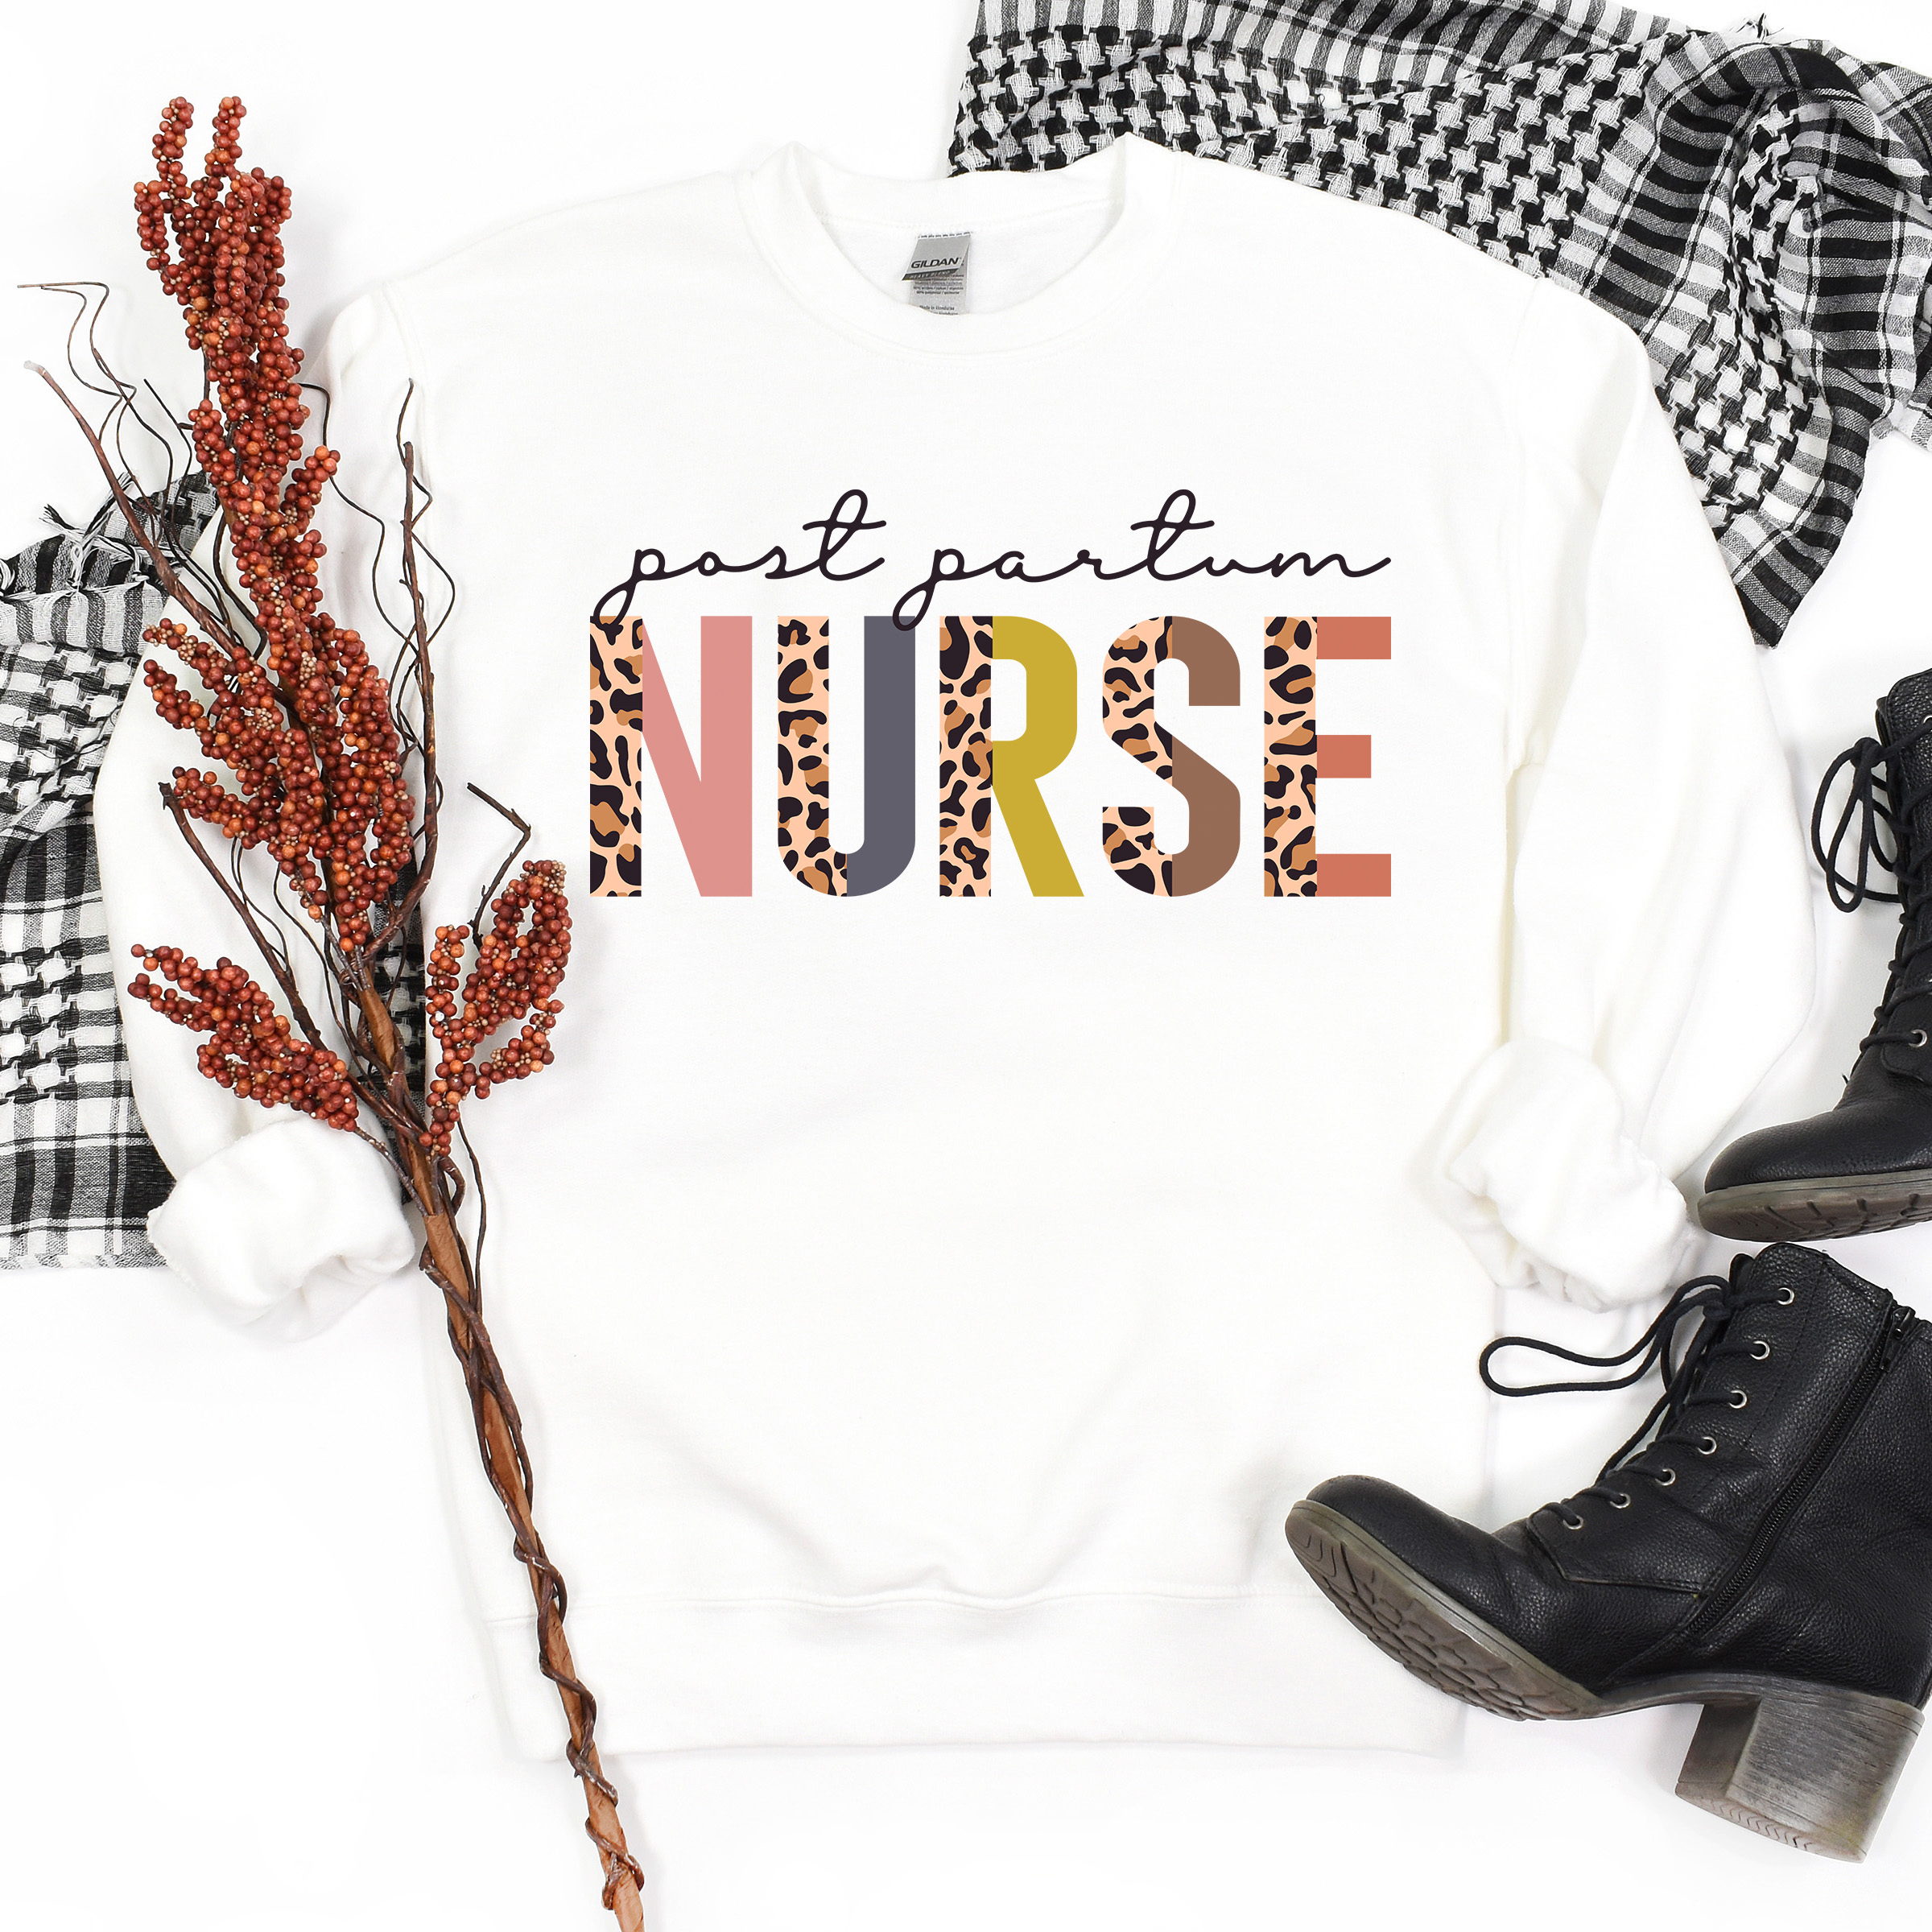 Post Partum Nurse Gift   Leopard Print   After Birth Care   Postpartum Nurse Sweatshirt   Nursing Student   Unisex Crewneck Sweatshirt